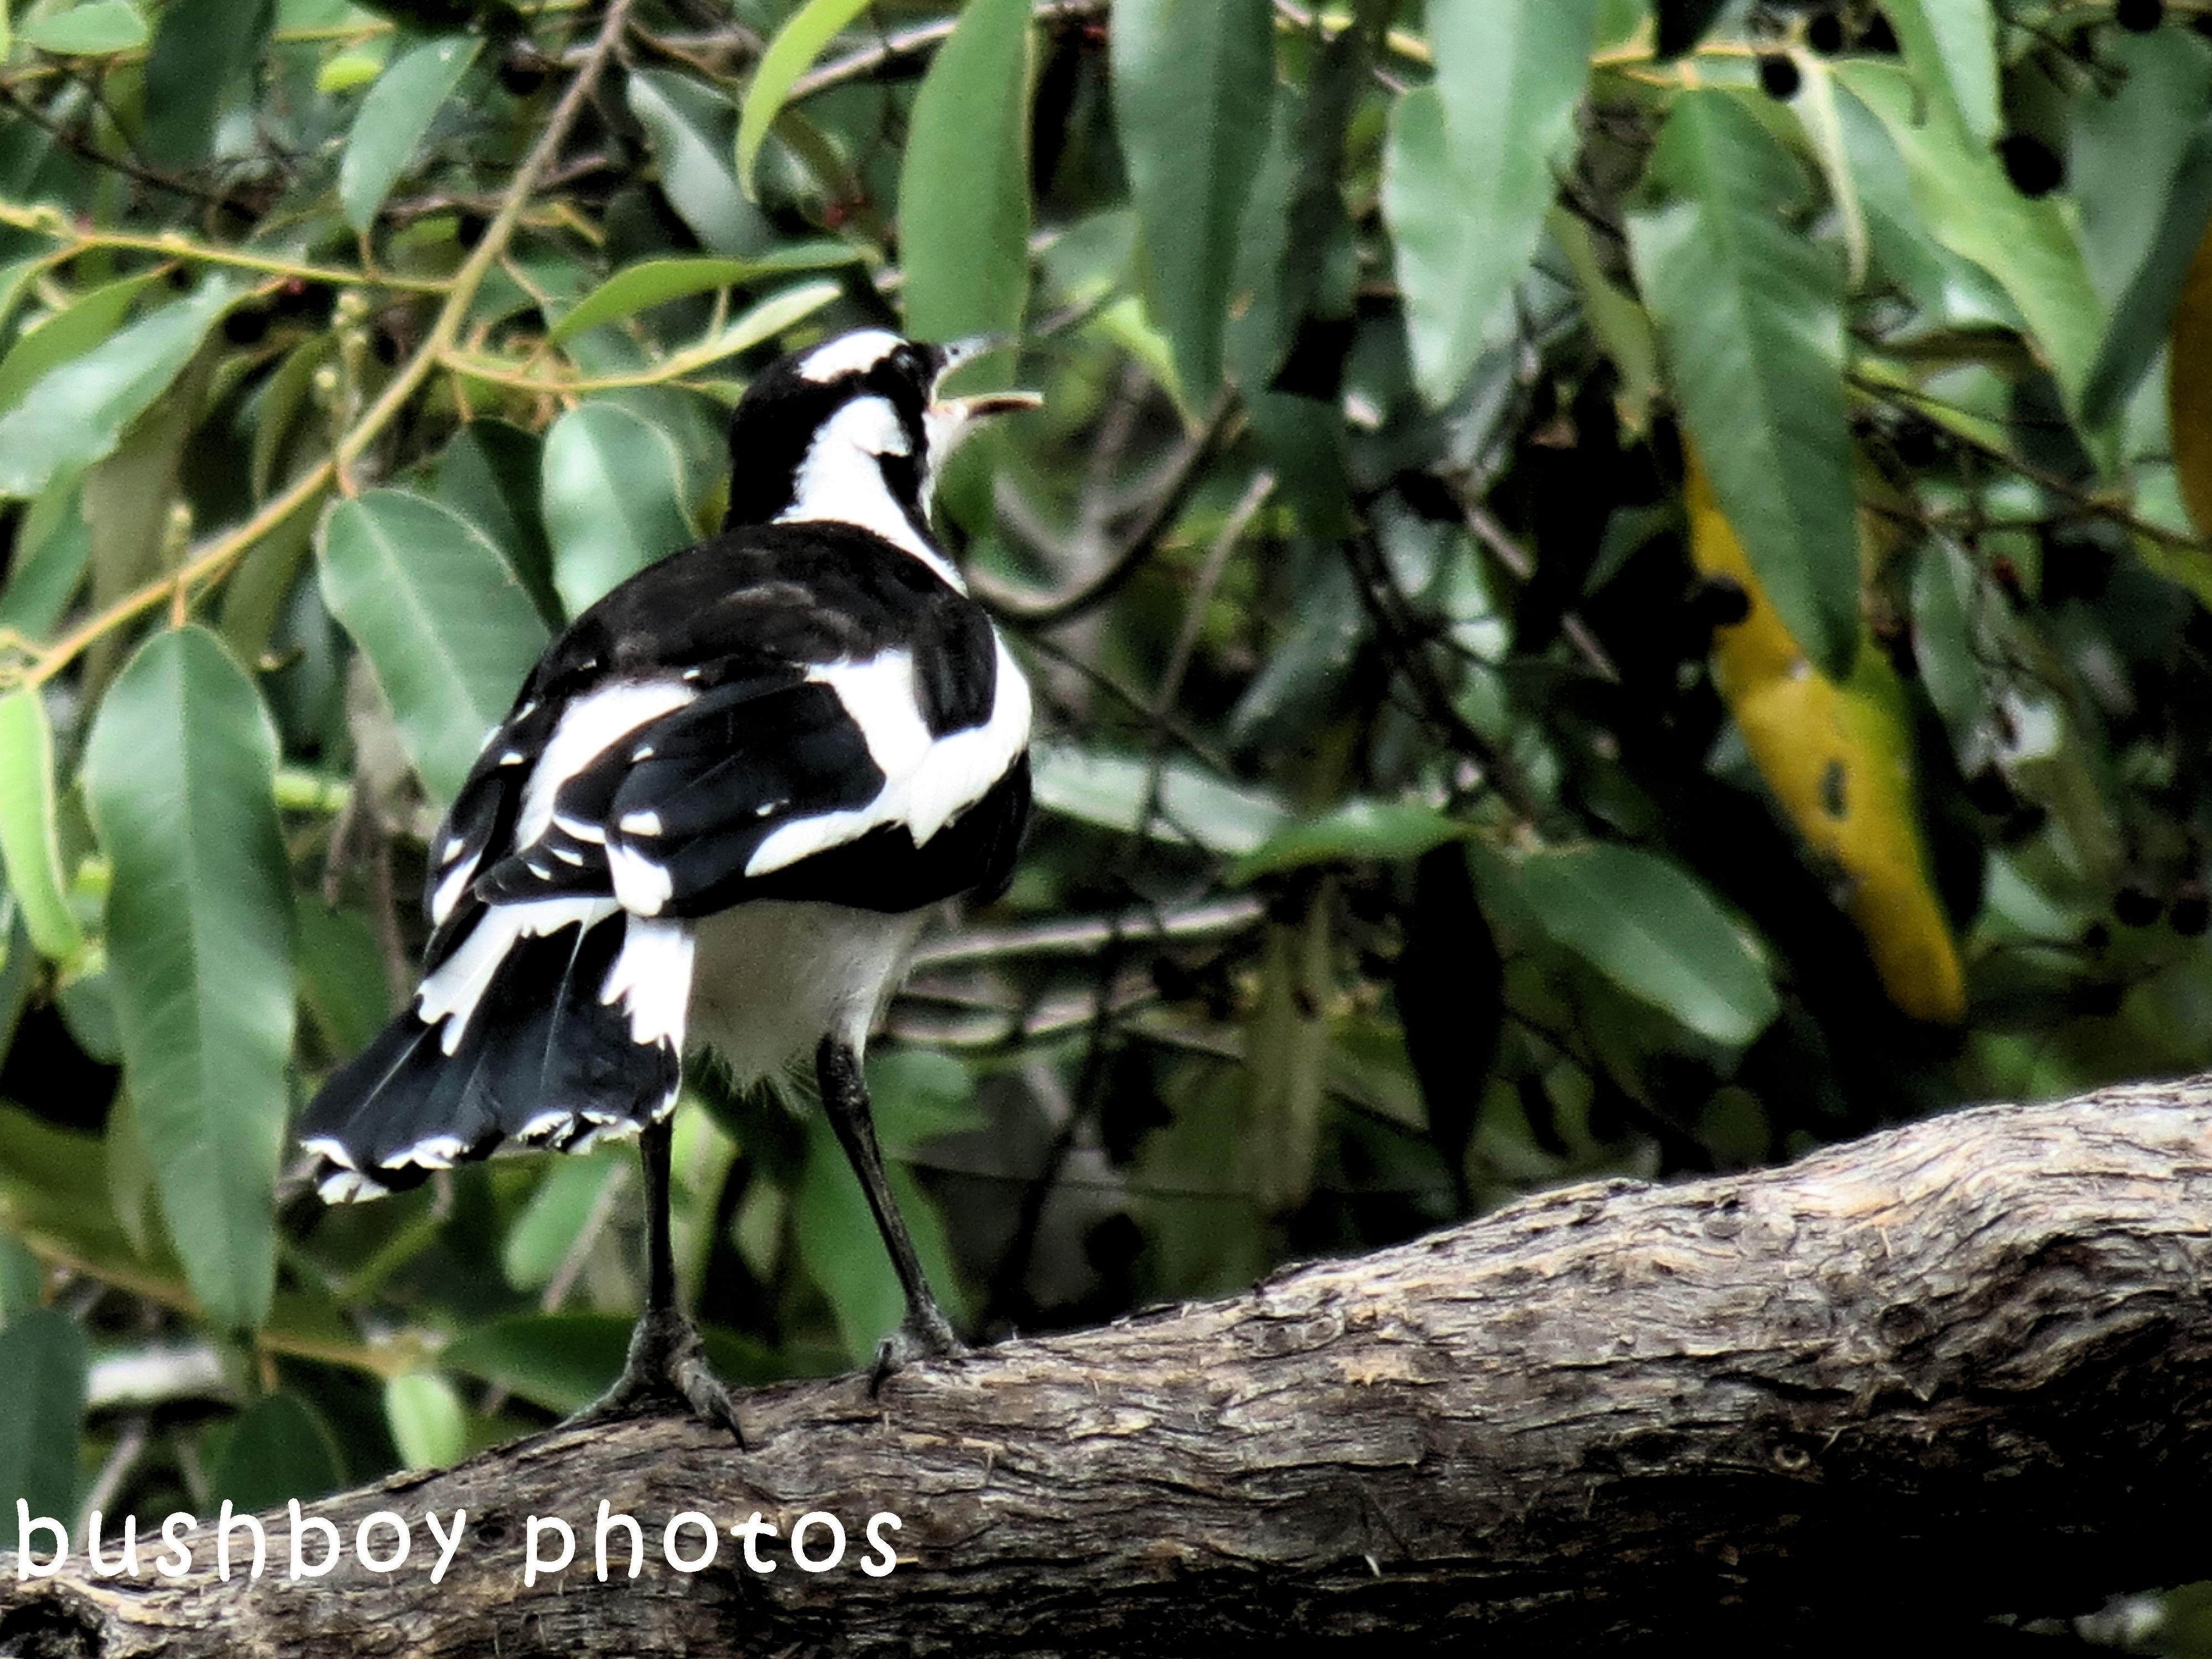 180629_blog challenge_black and white_birds_magpie lark